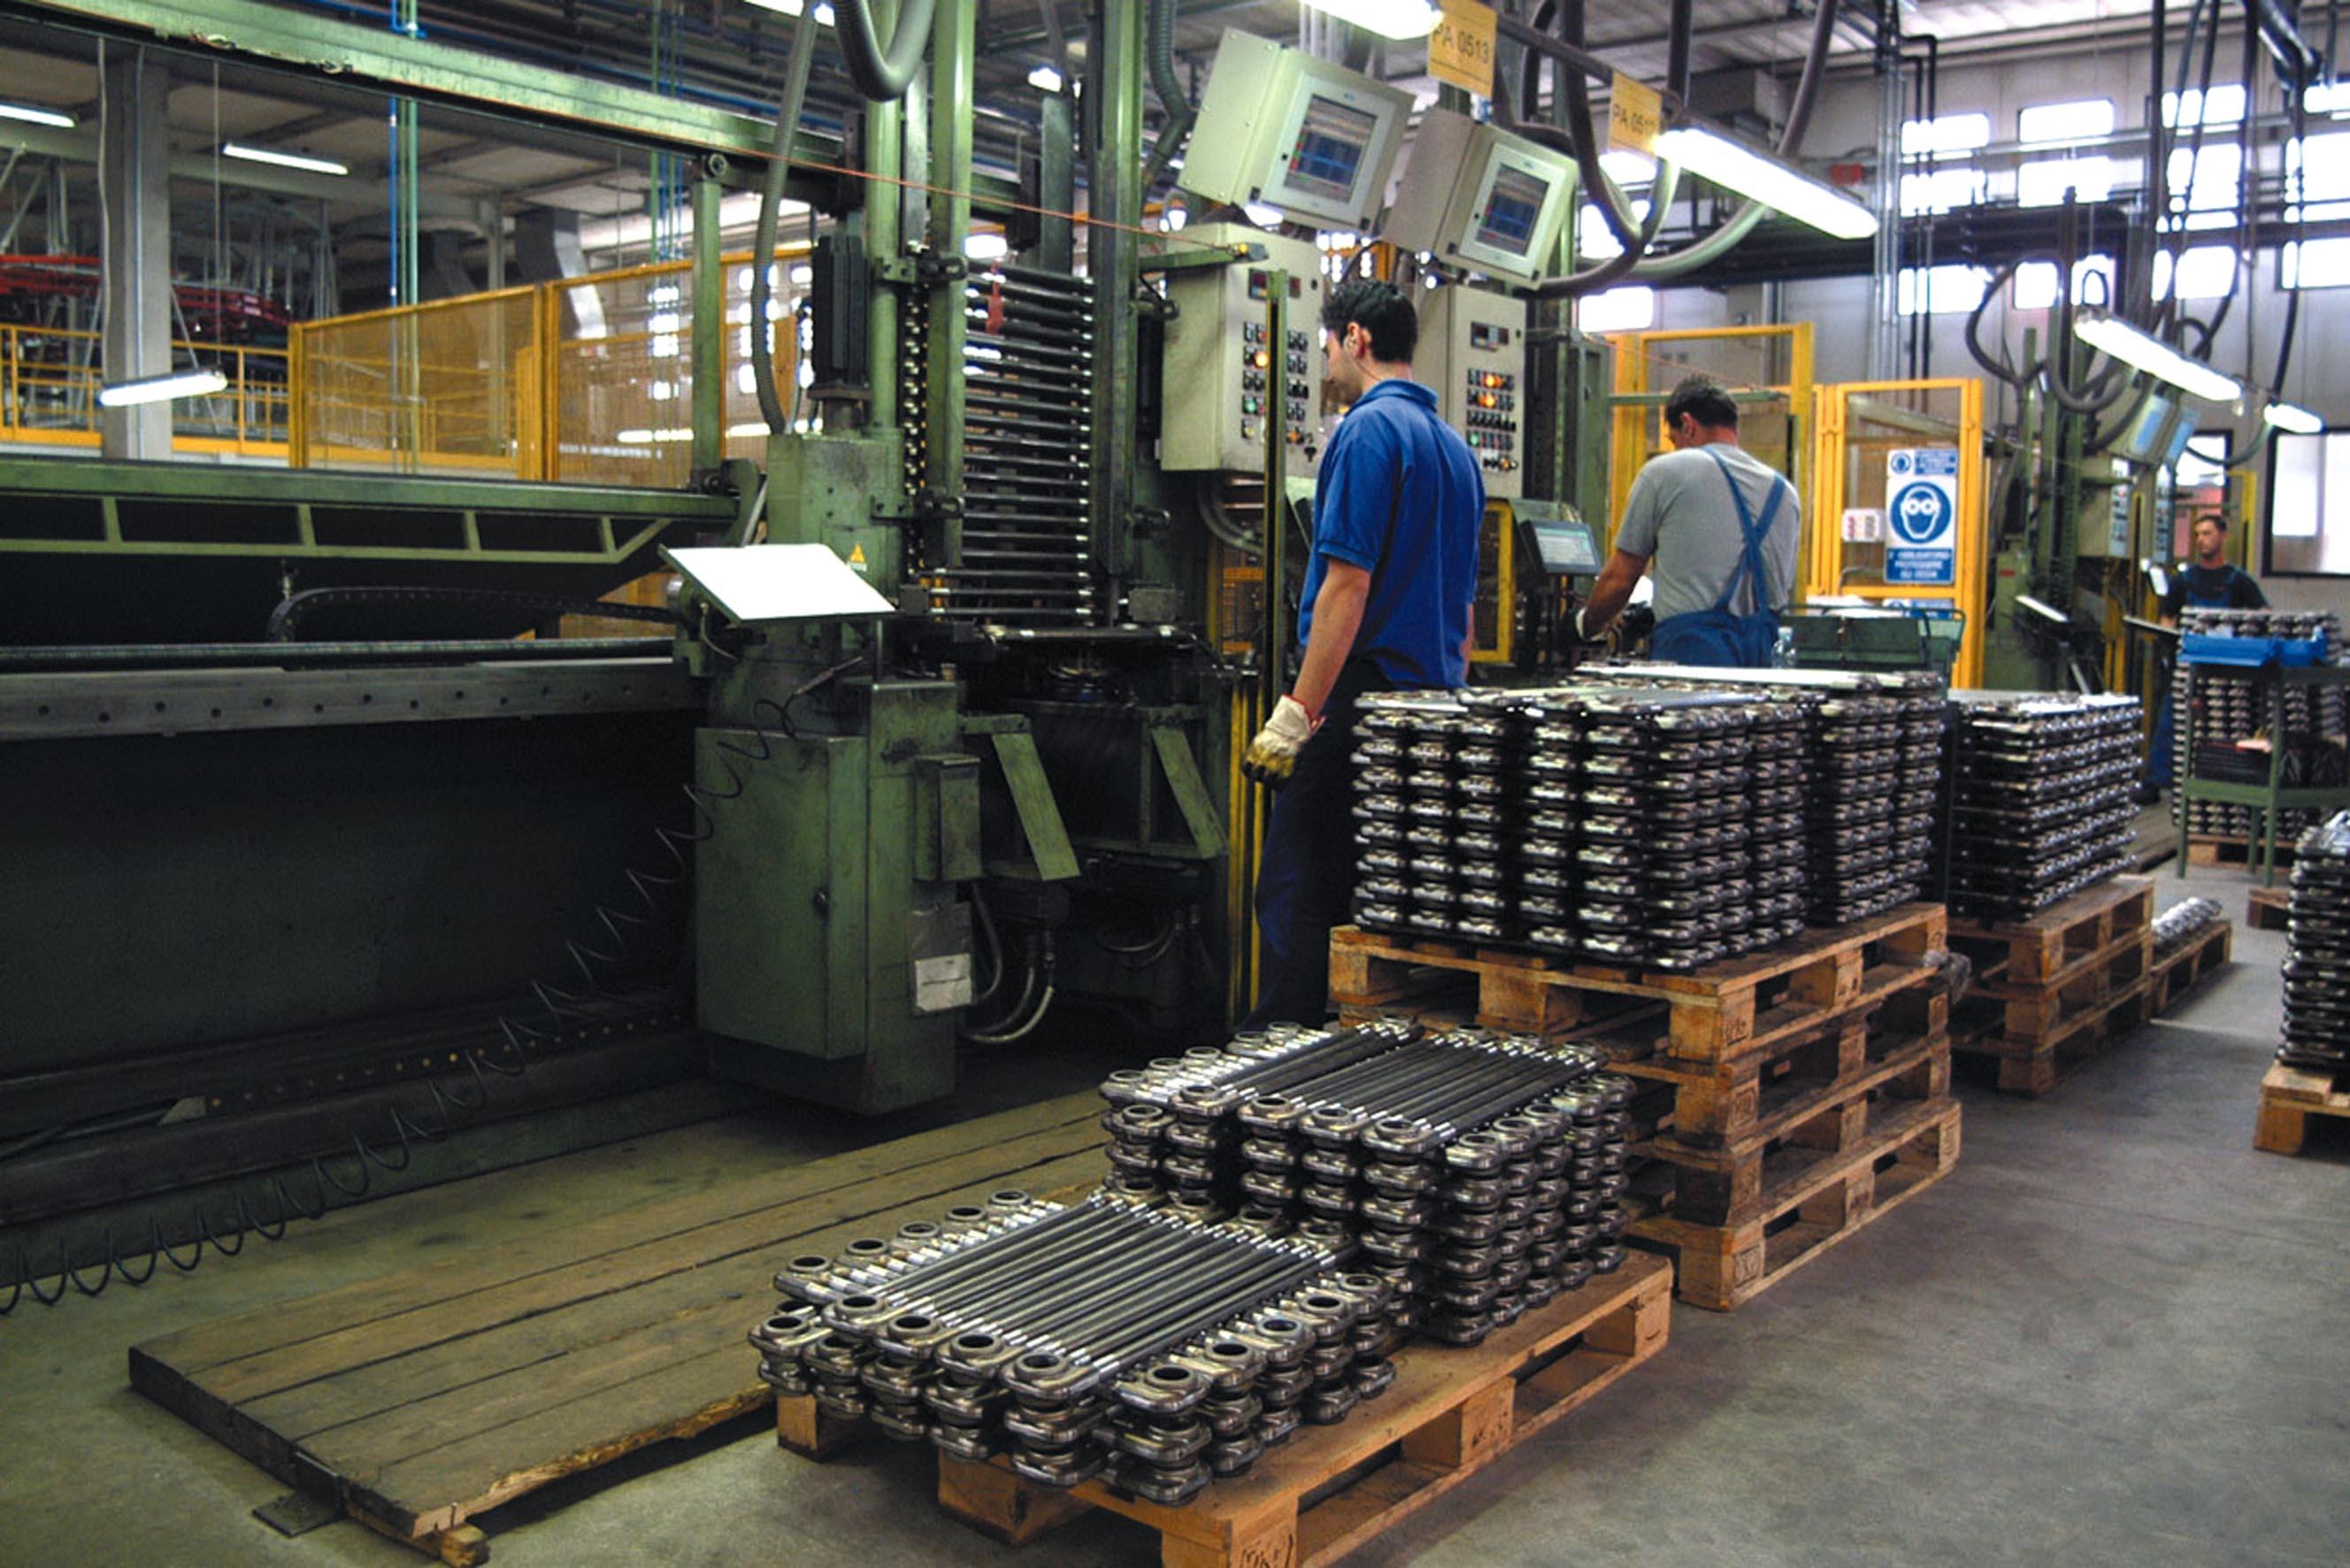 Studio Cerved: ecatombe per le imprese siciliane: perdite tra i 5 e 10 miliardi